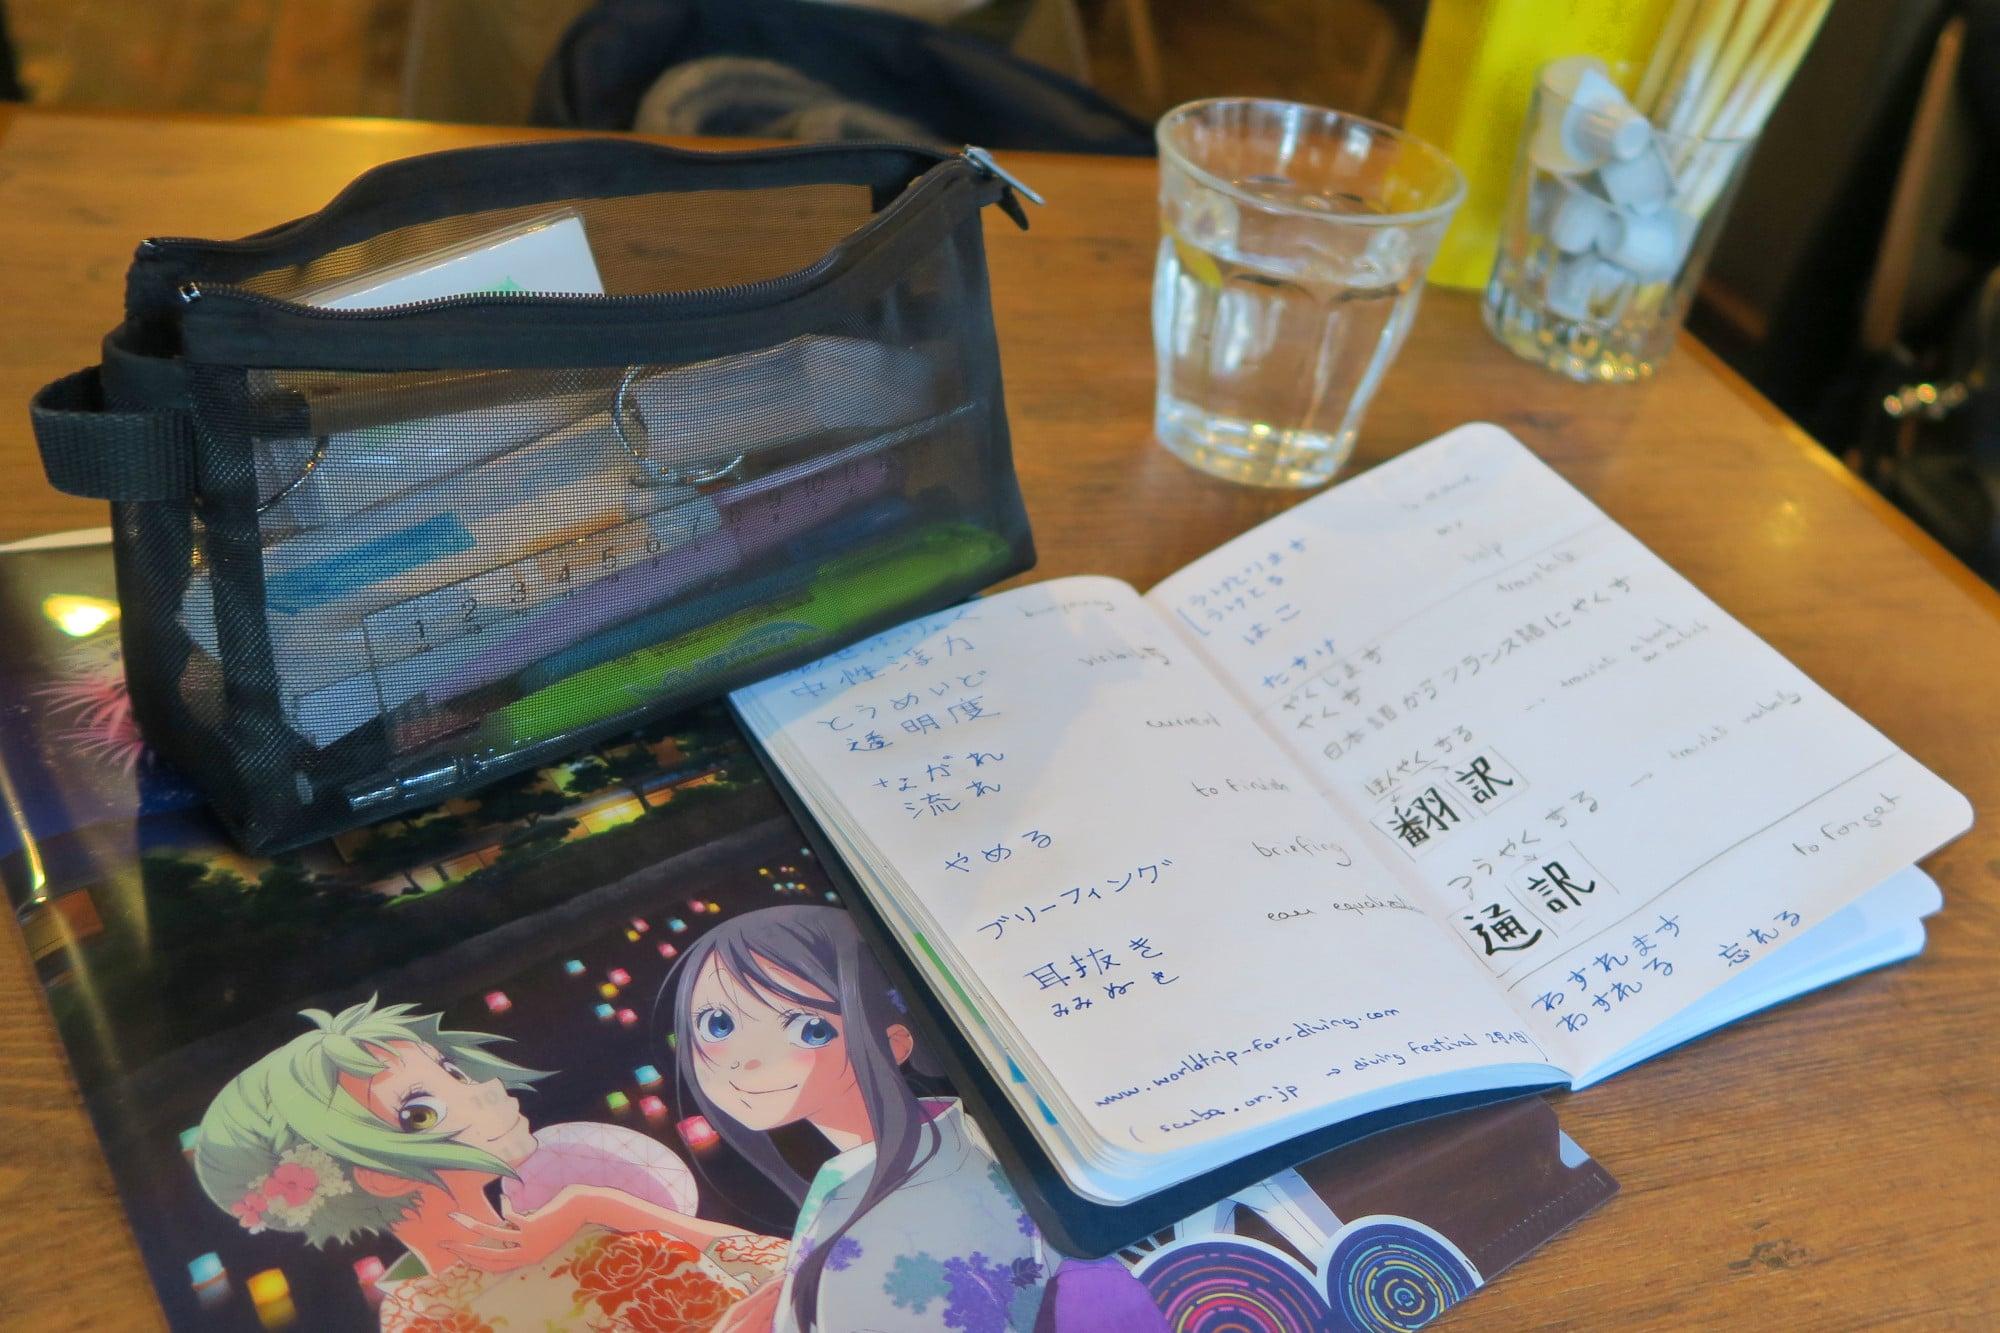 Stuying Japanese at cafés in Tokyo